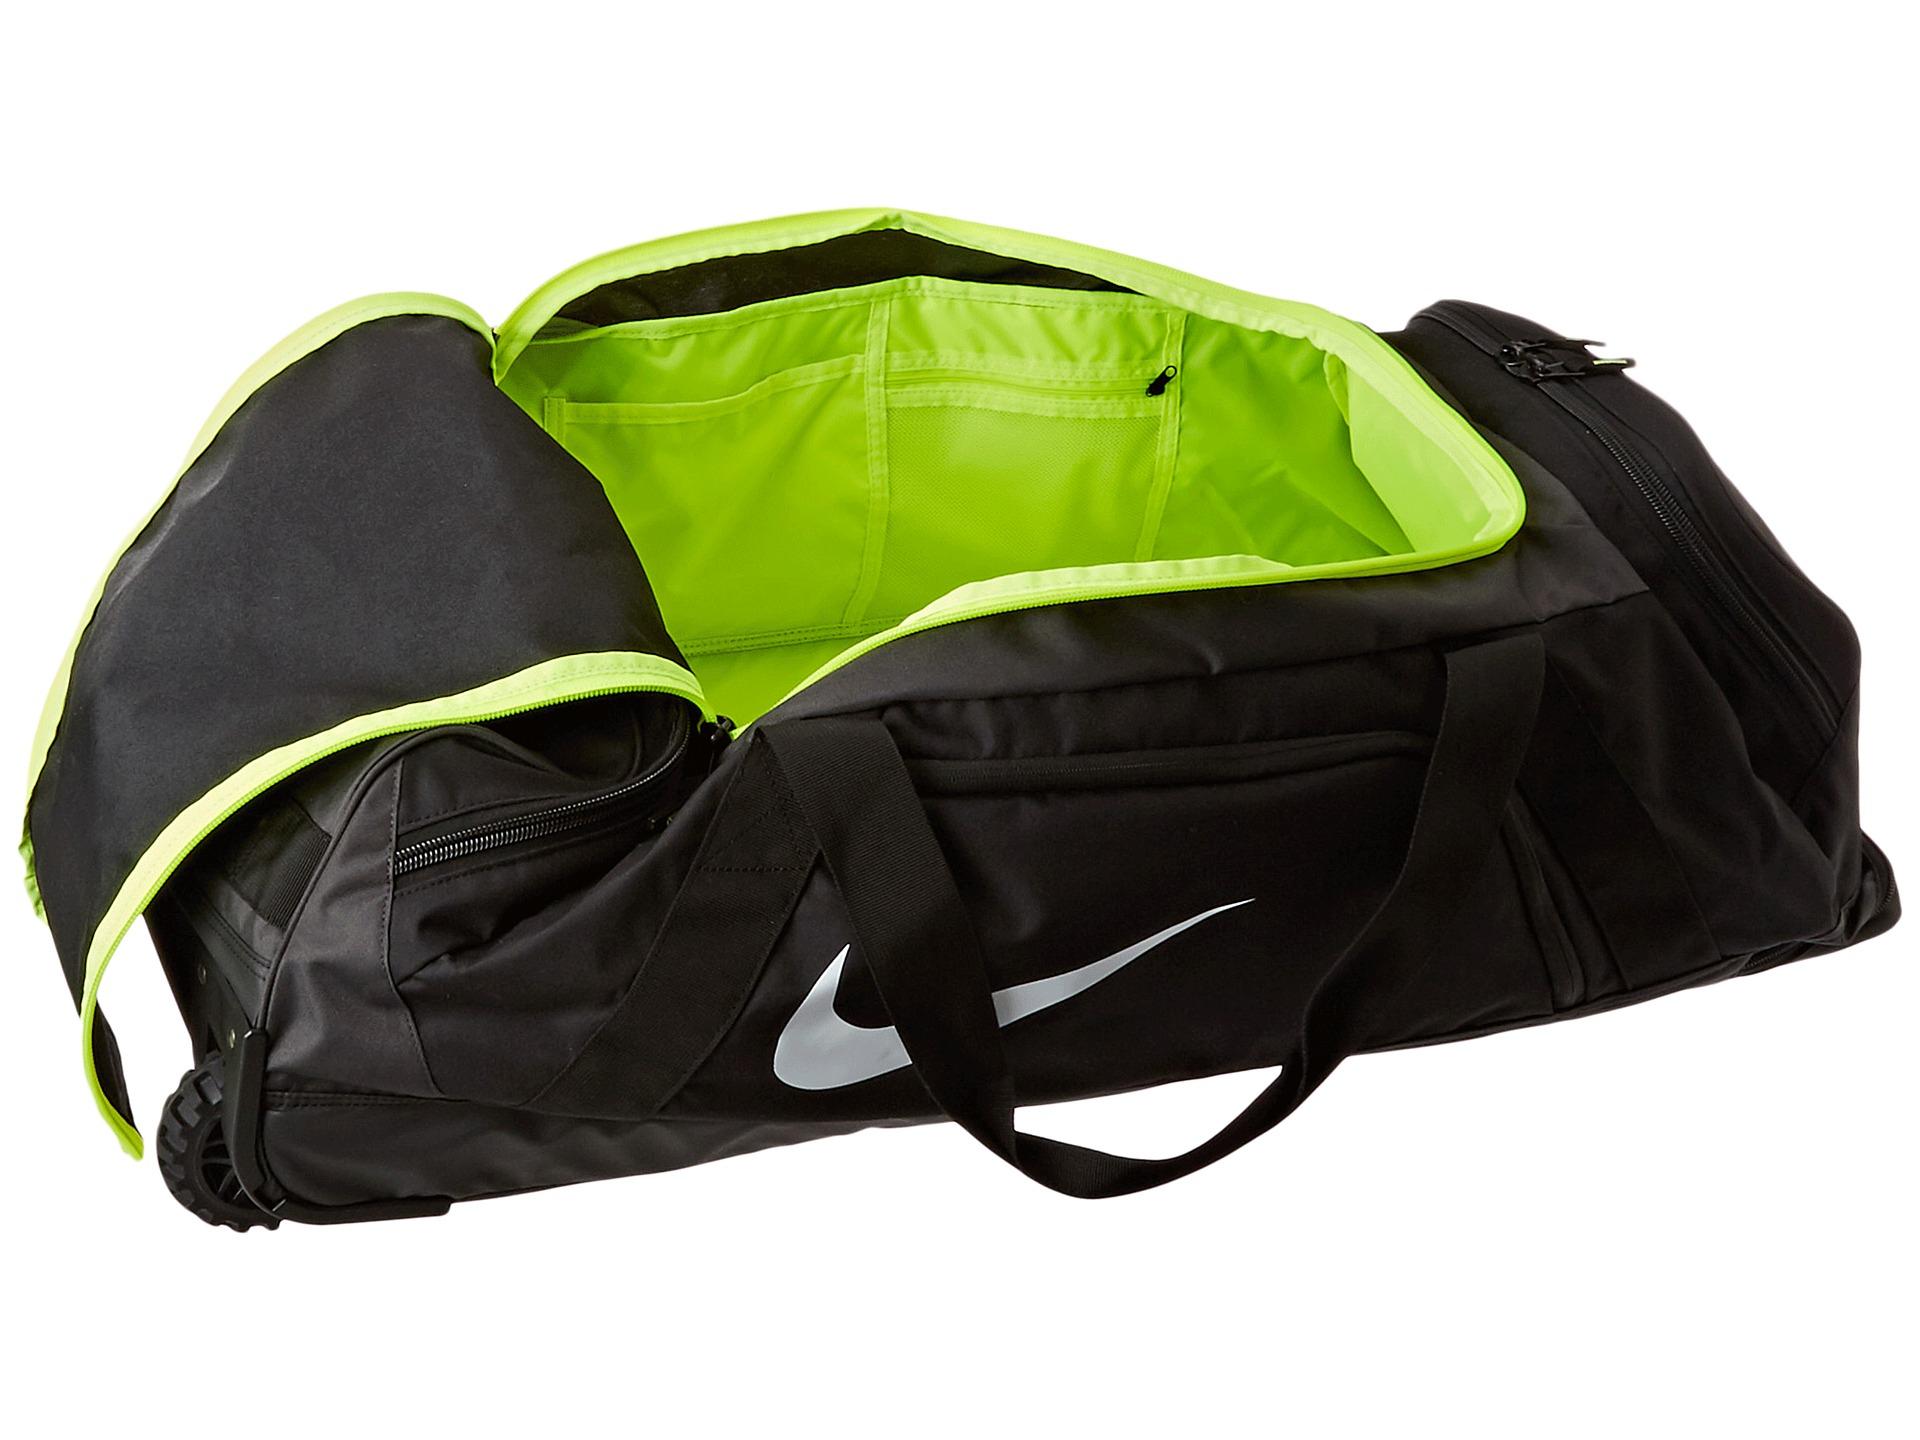 59226a7f60f5 Lyst - Nike Mvp Elite Roller Bag in Gray